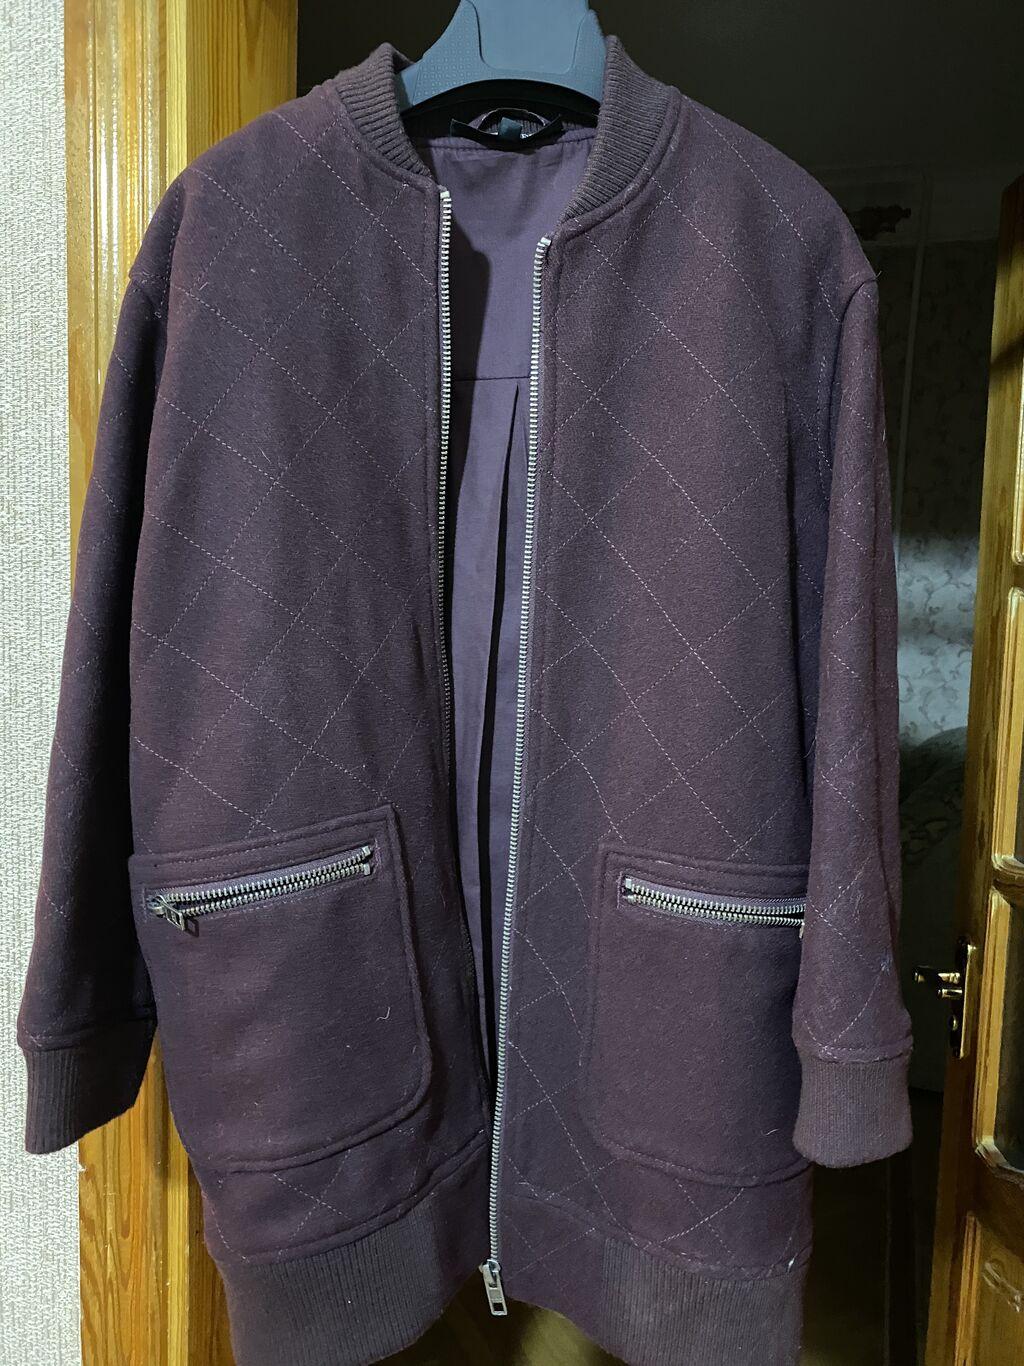 Topshop palto,ideal vezyetde S-M olcusu